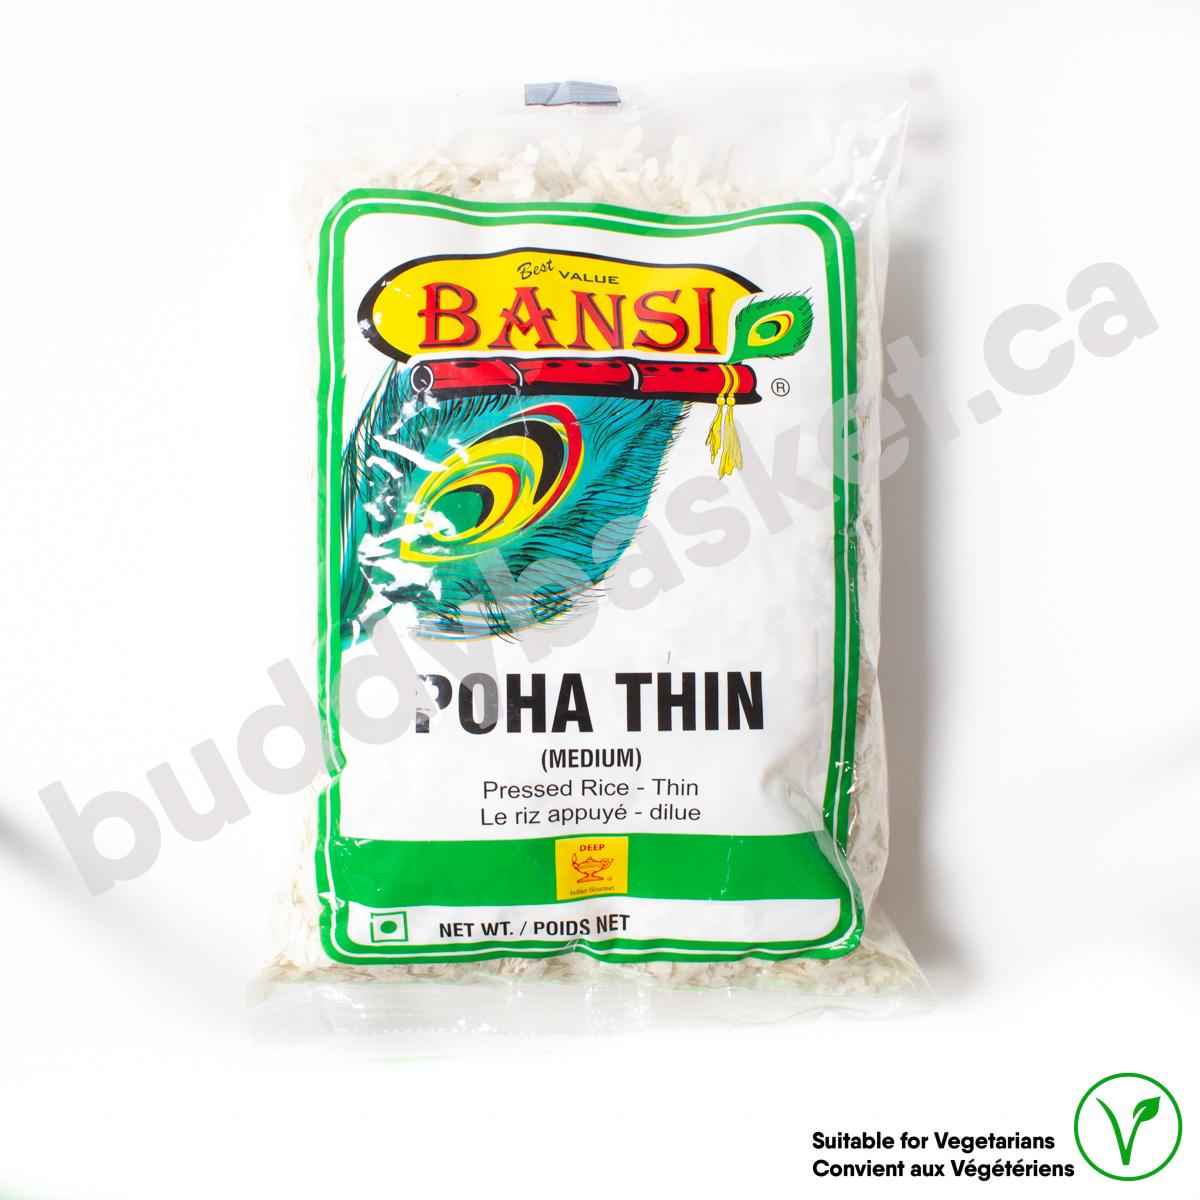 Bansi Poha Thin 2 lb